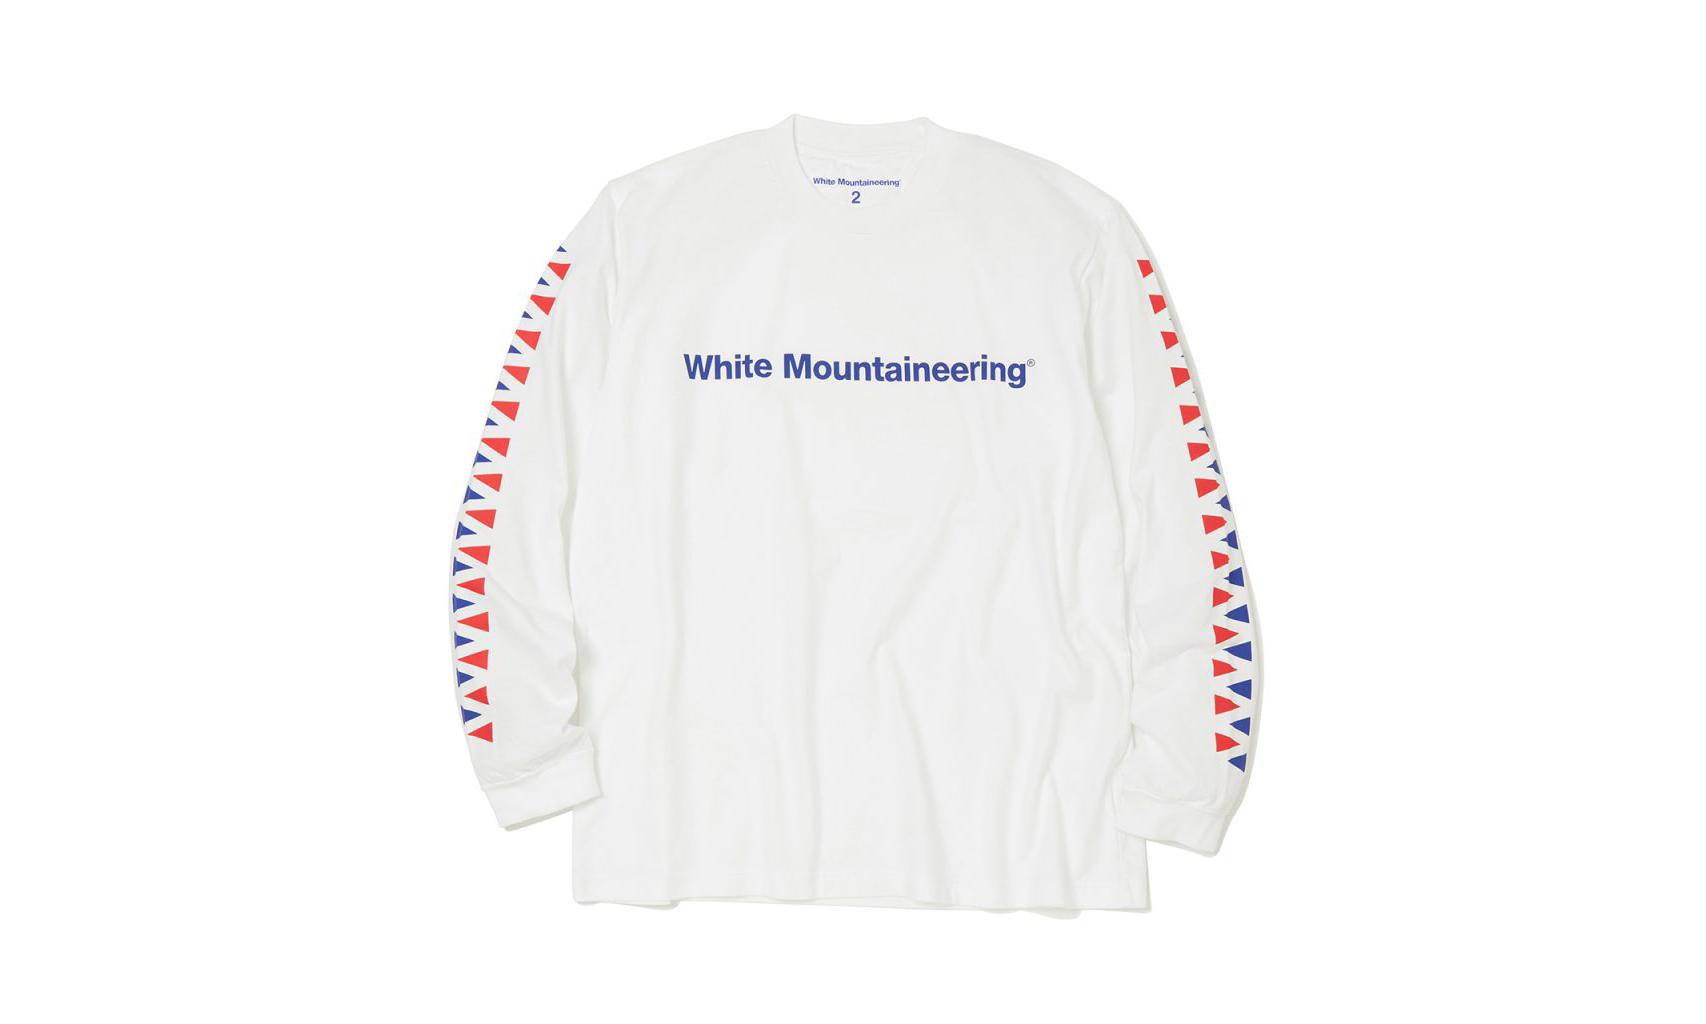 White Mountaineering 推出 2020 春夏胶囊系列「Repose Wear」